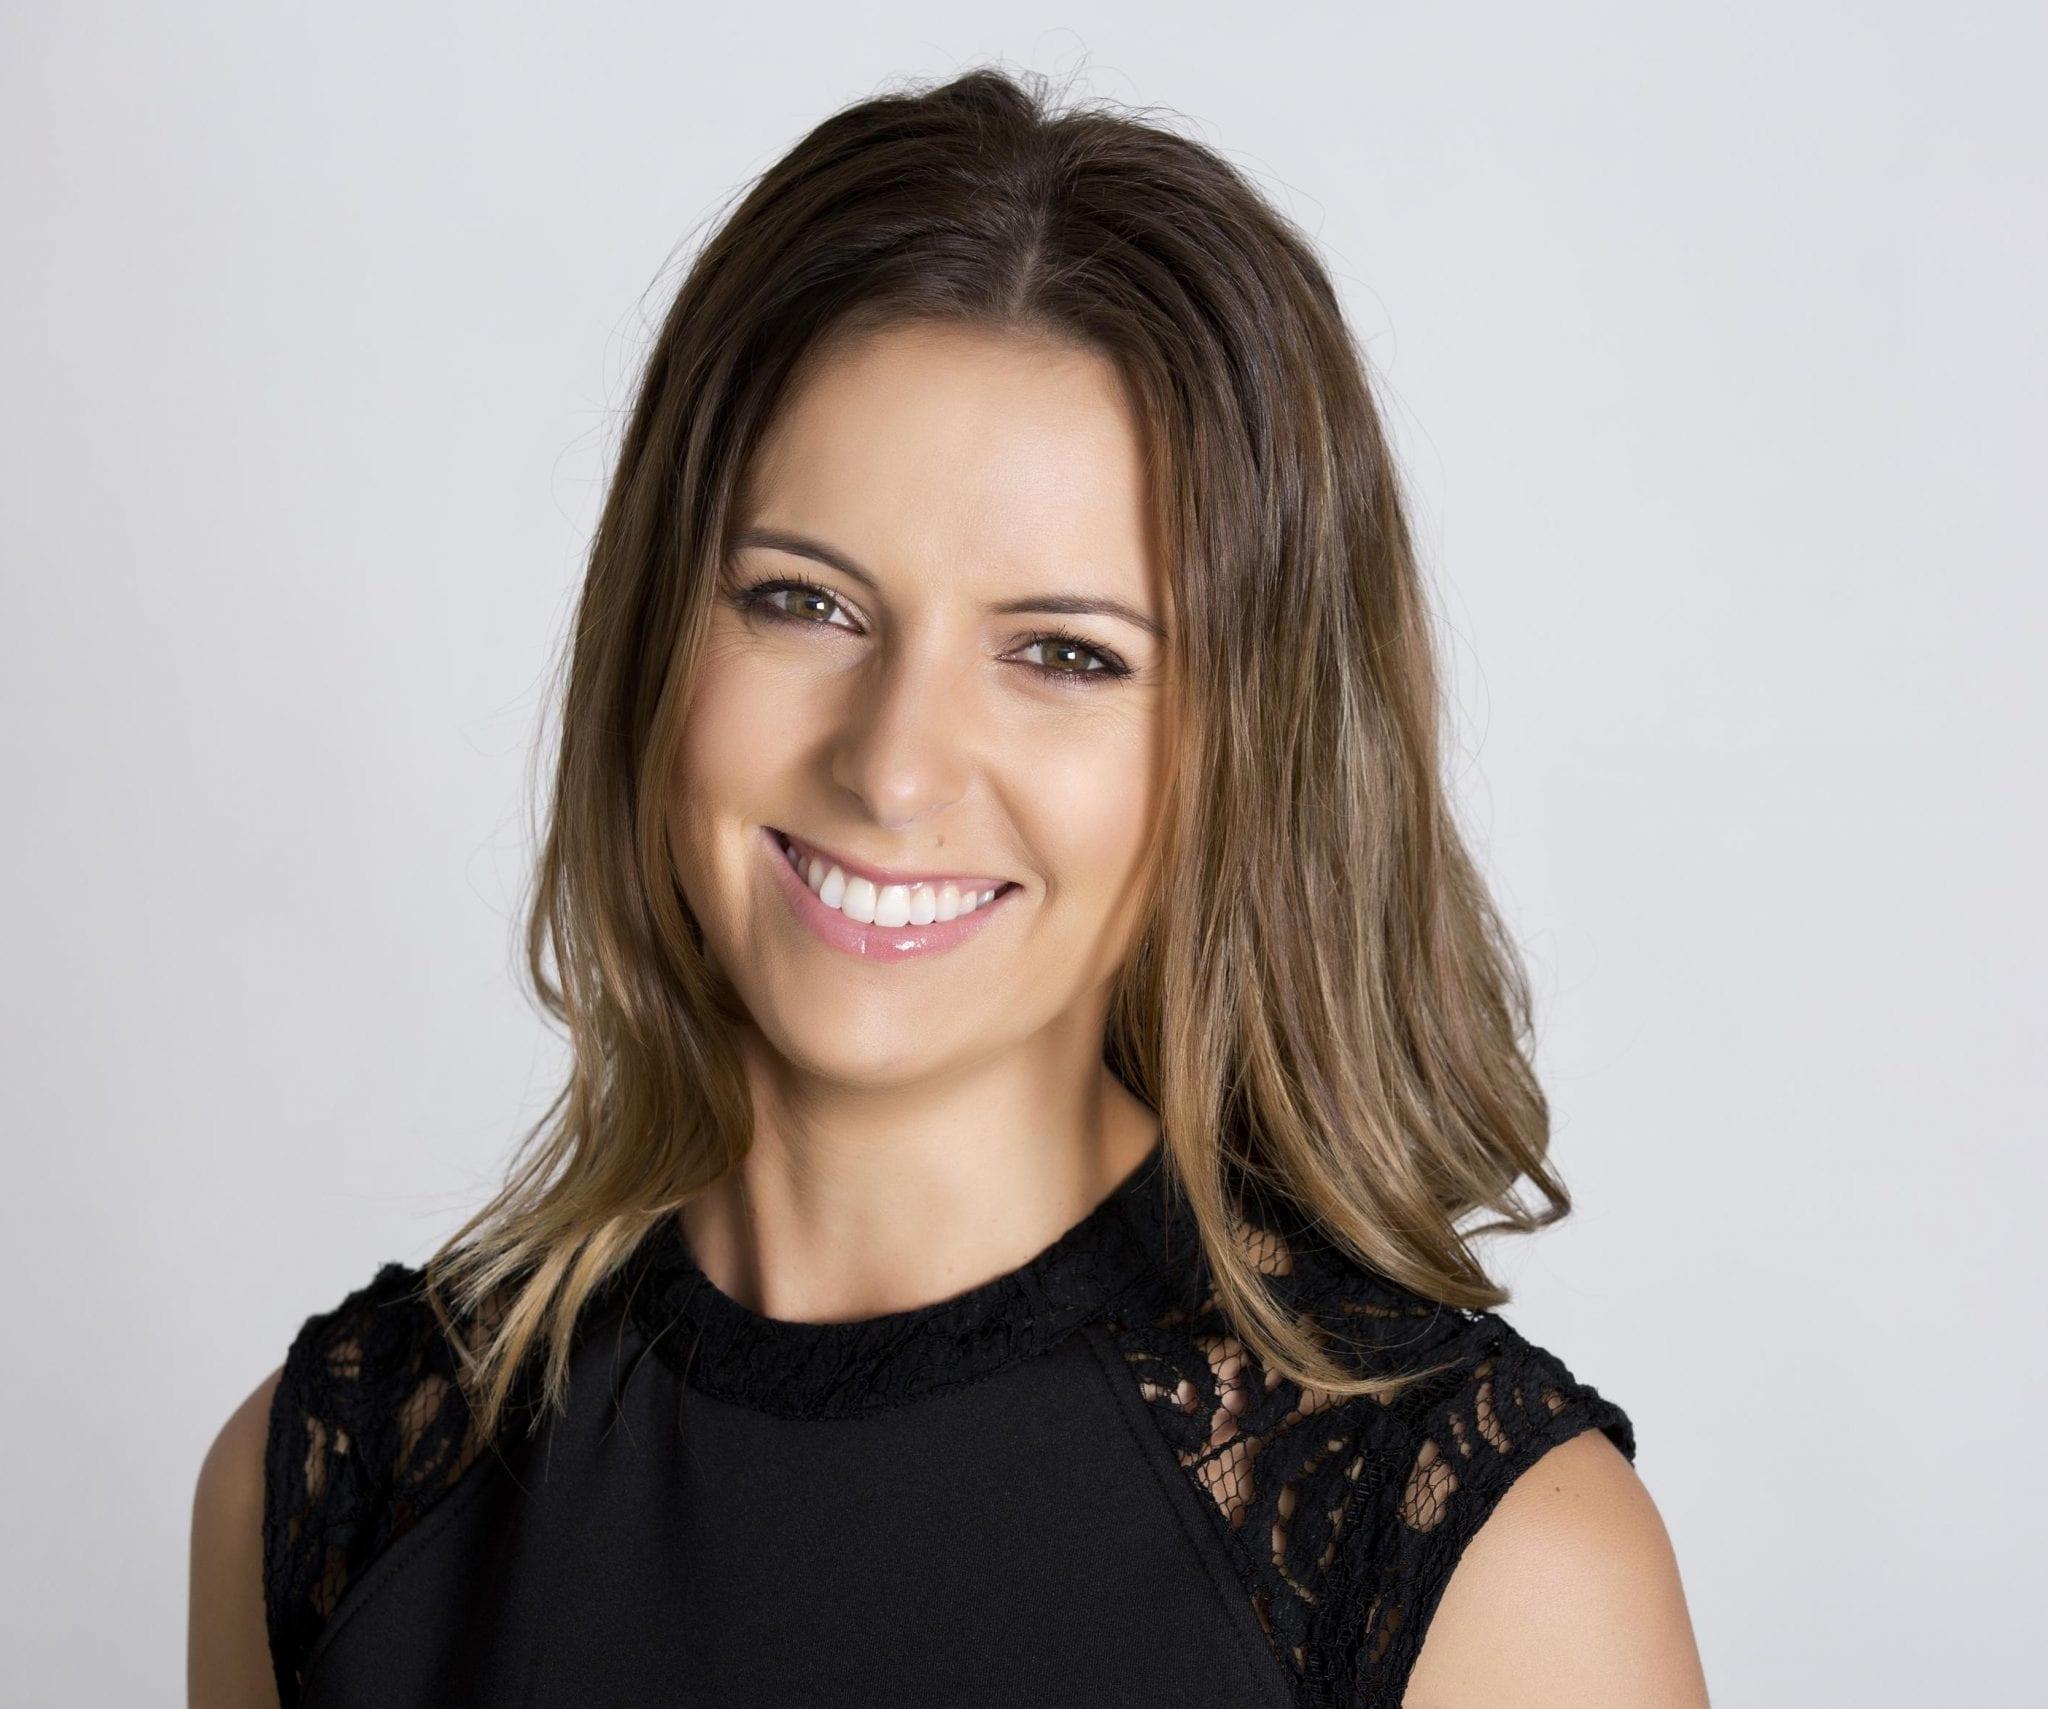 Amanda Higl Hair Stylist Make-up Artist Gold Coast